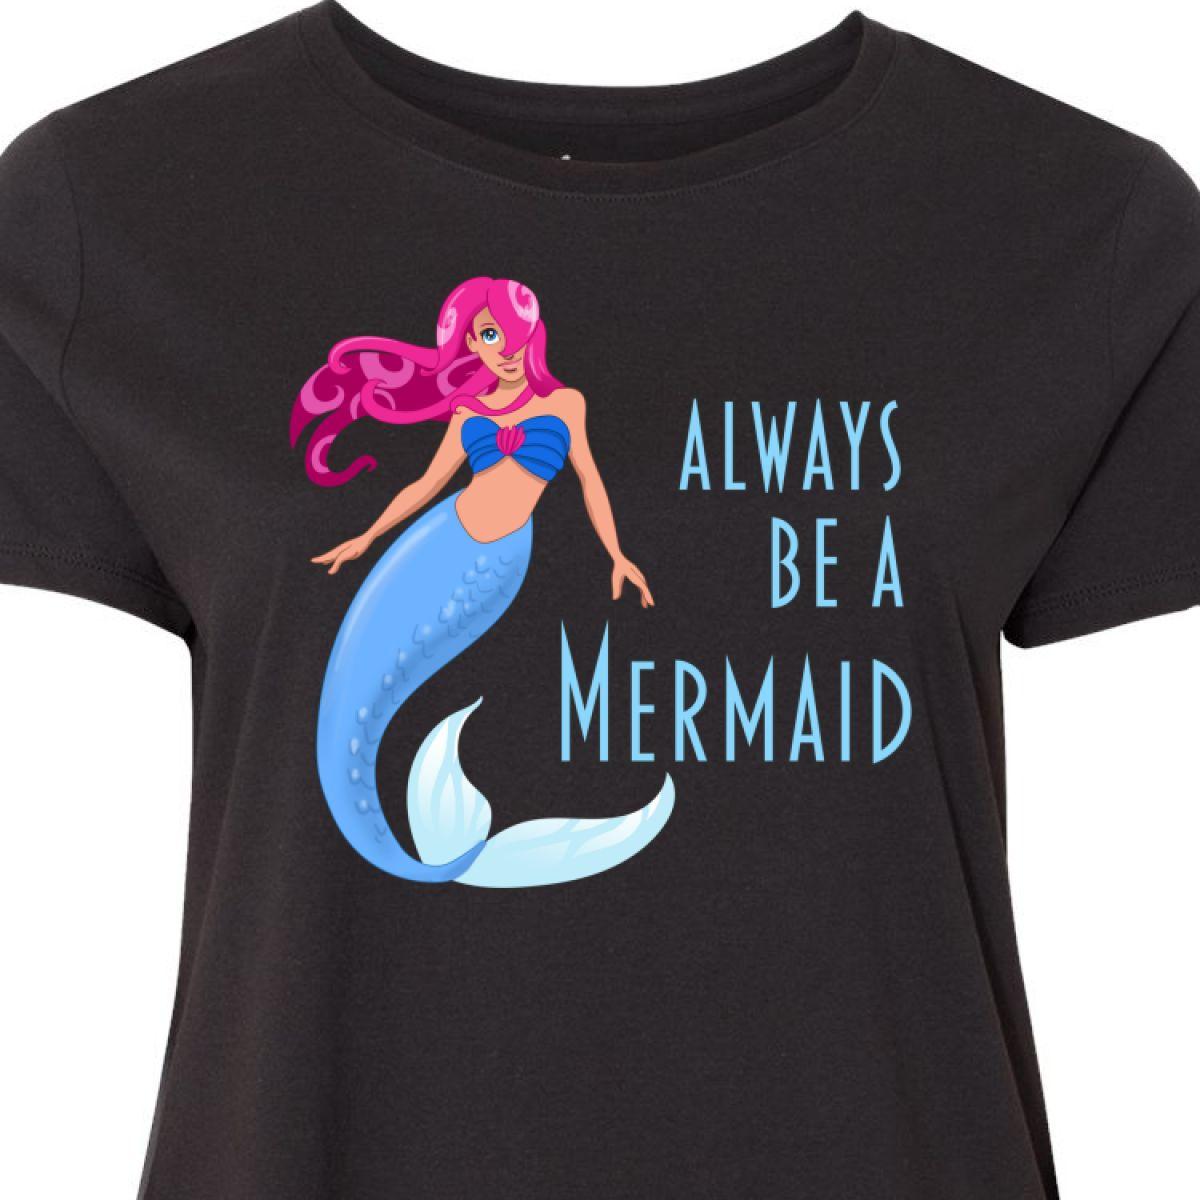 7e0f861c0 Inktastic Always Be A Mermaid Blue Tail Women's Plus Size T-Shirt ...